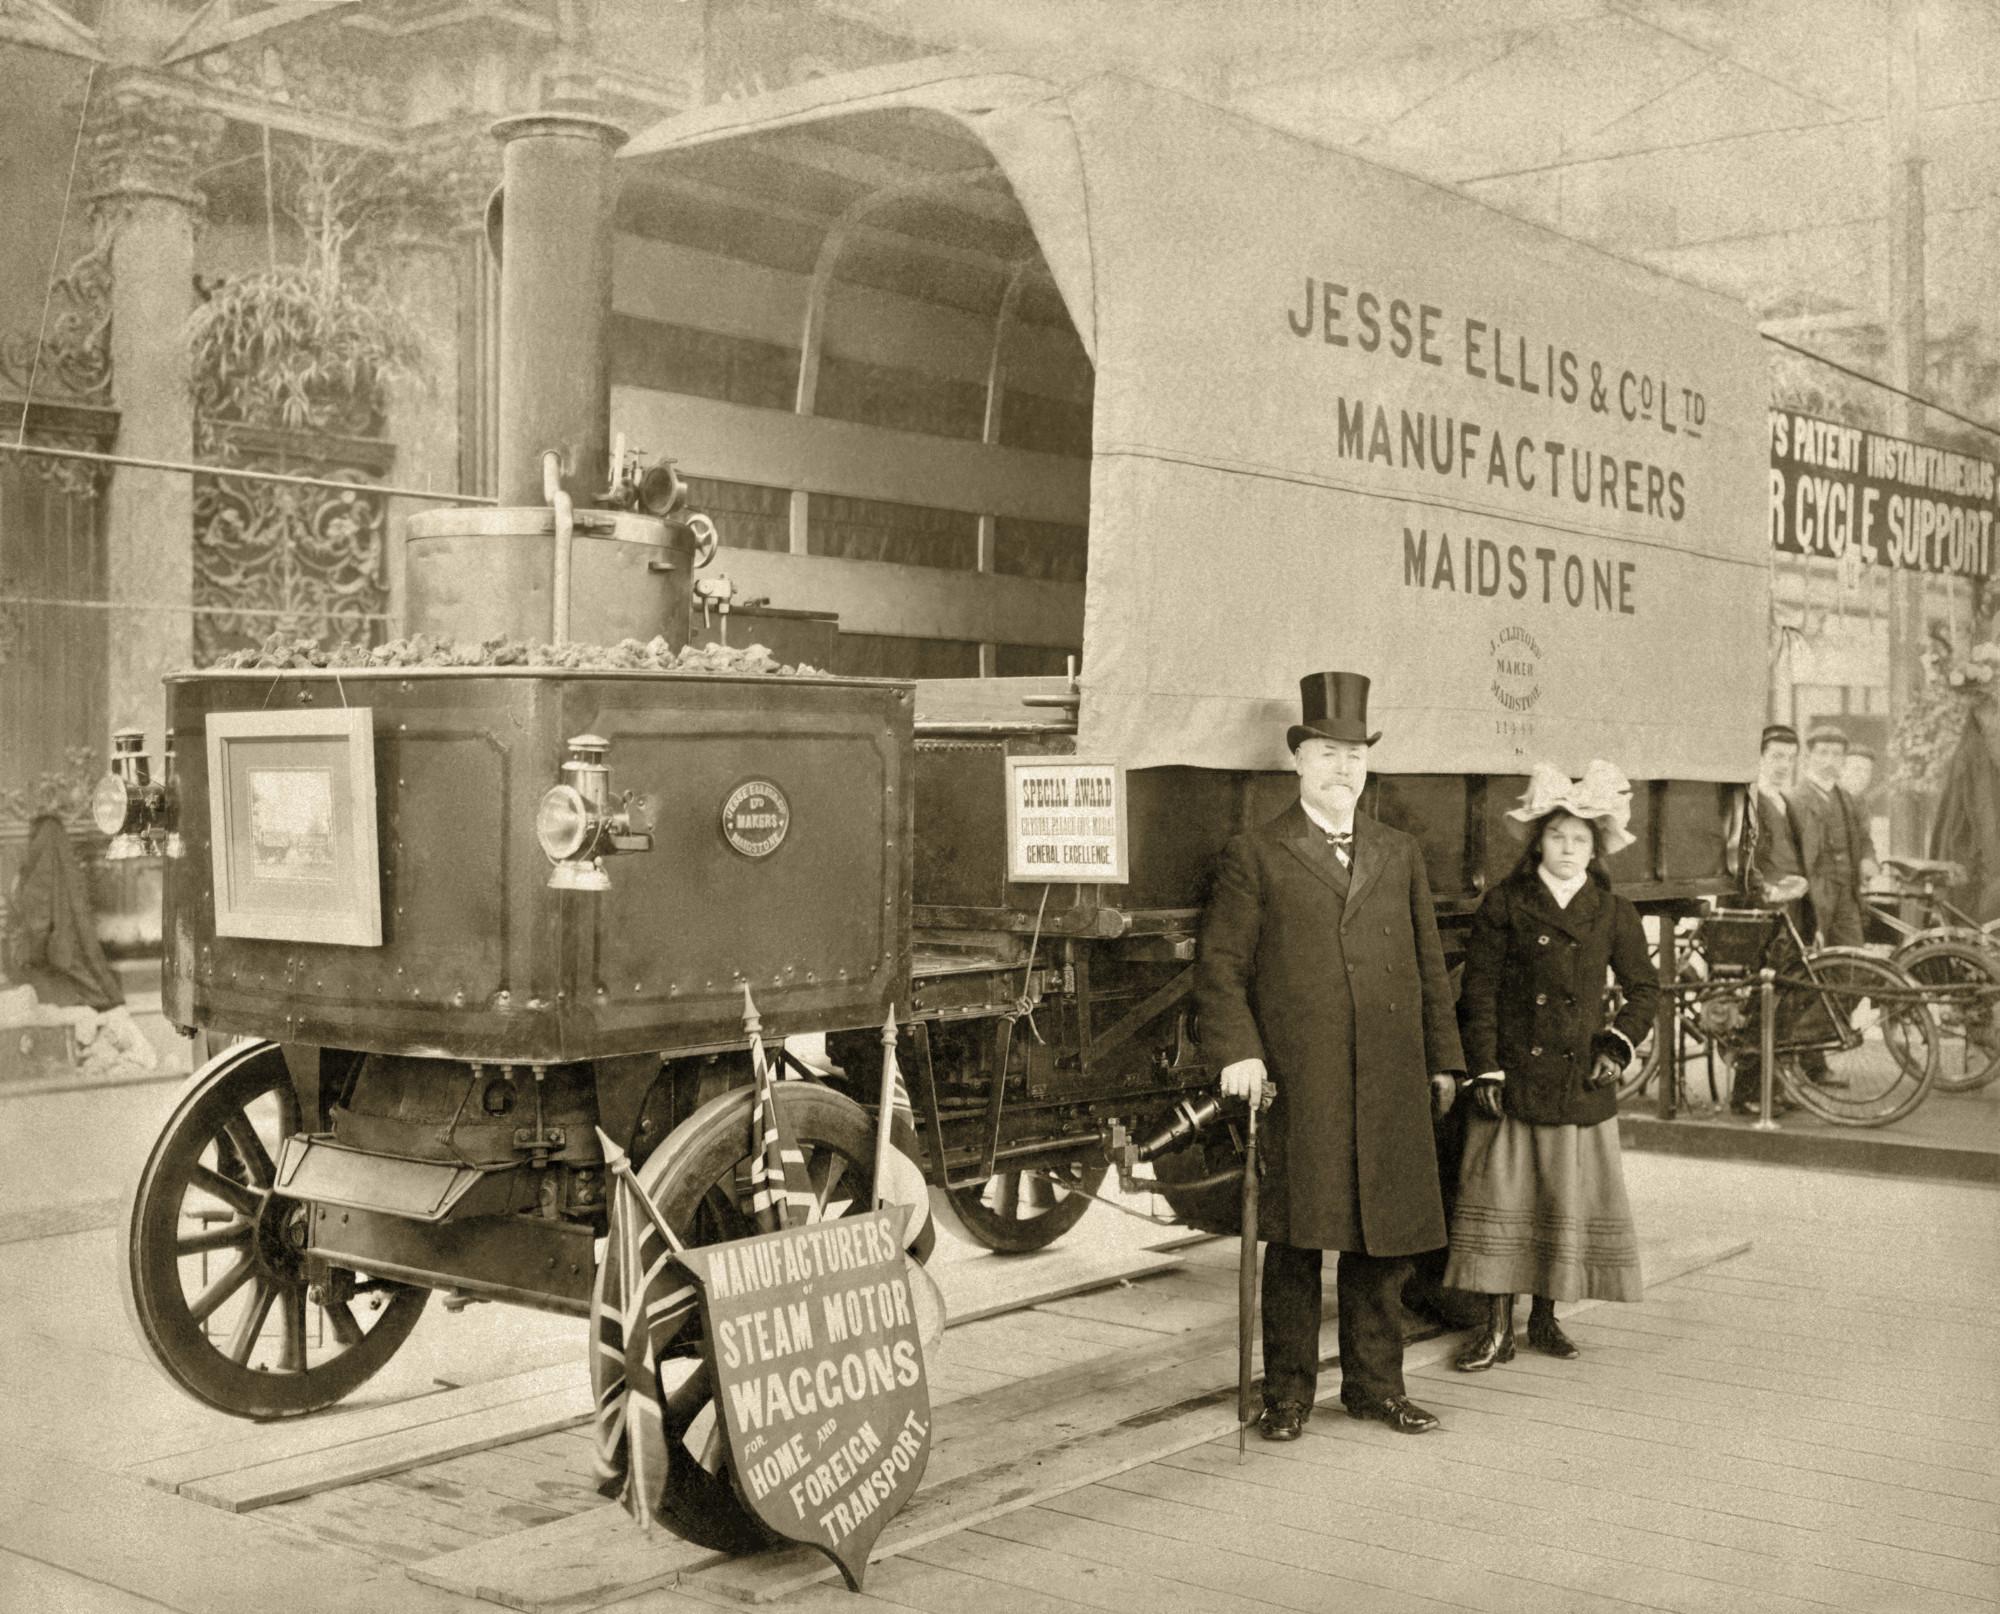 Jesse Ellis Wagons of Maidstone